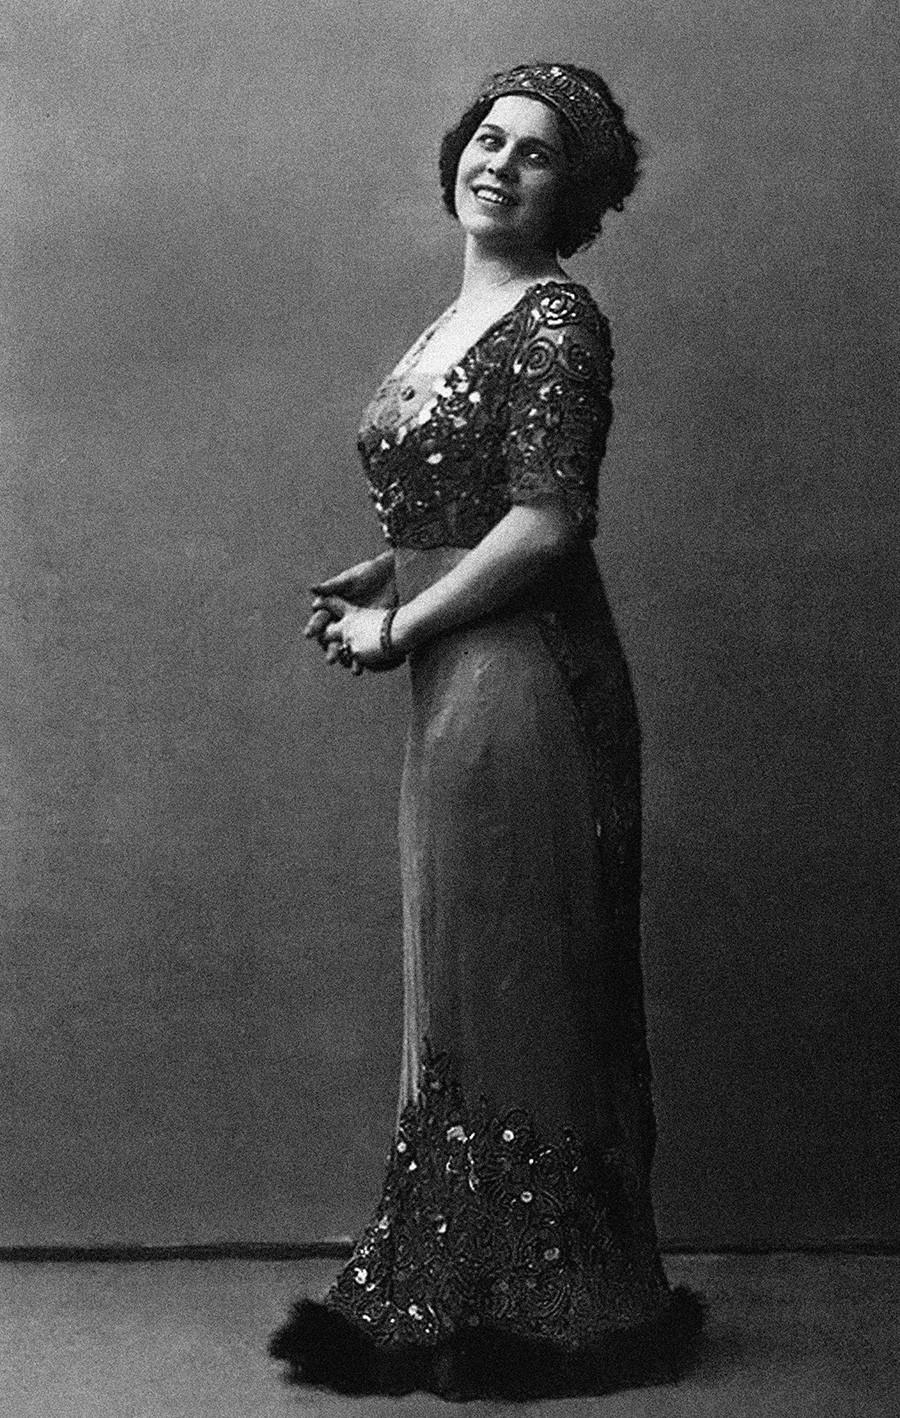 Nadežda Vasiljevna Plevickaja (1884-1940)